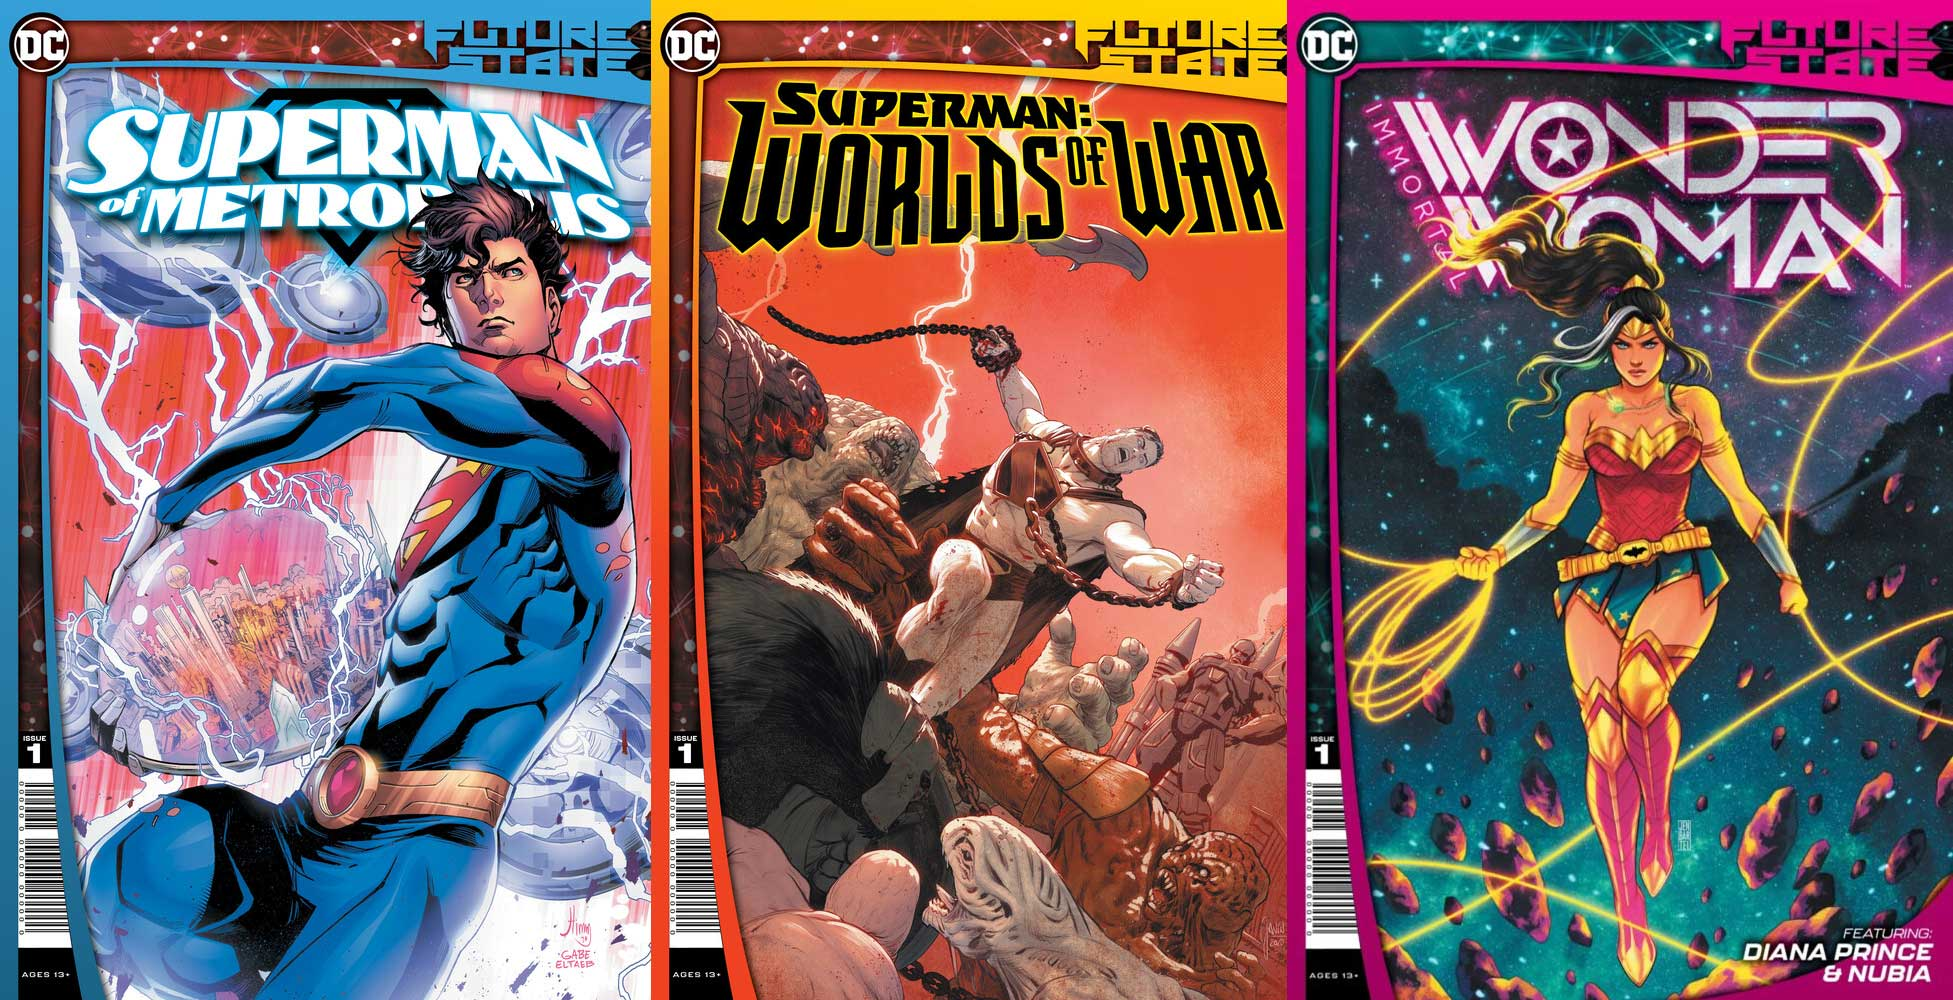 DC-Future-State-SupermanOfMetropolis-WorldsOfWar-ImmortalWonderWoman-DCComics